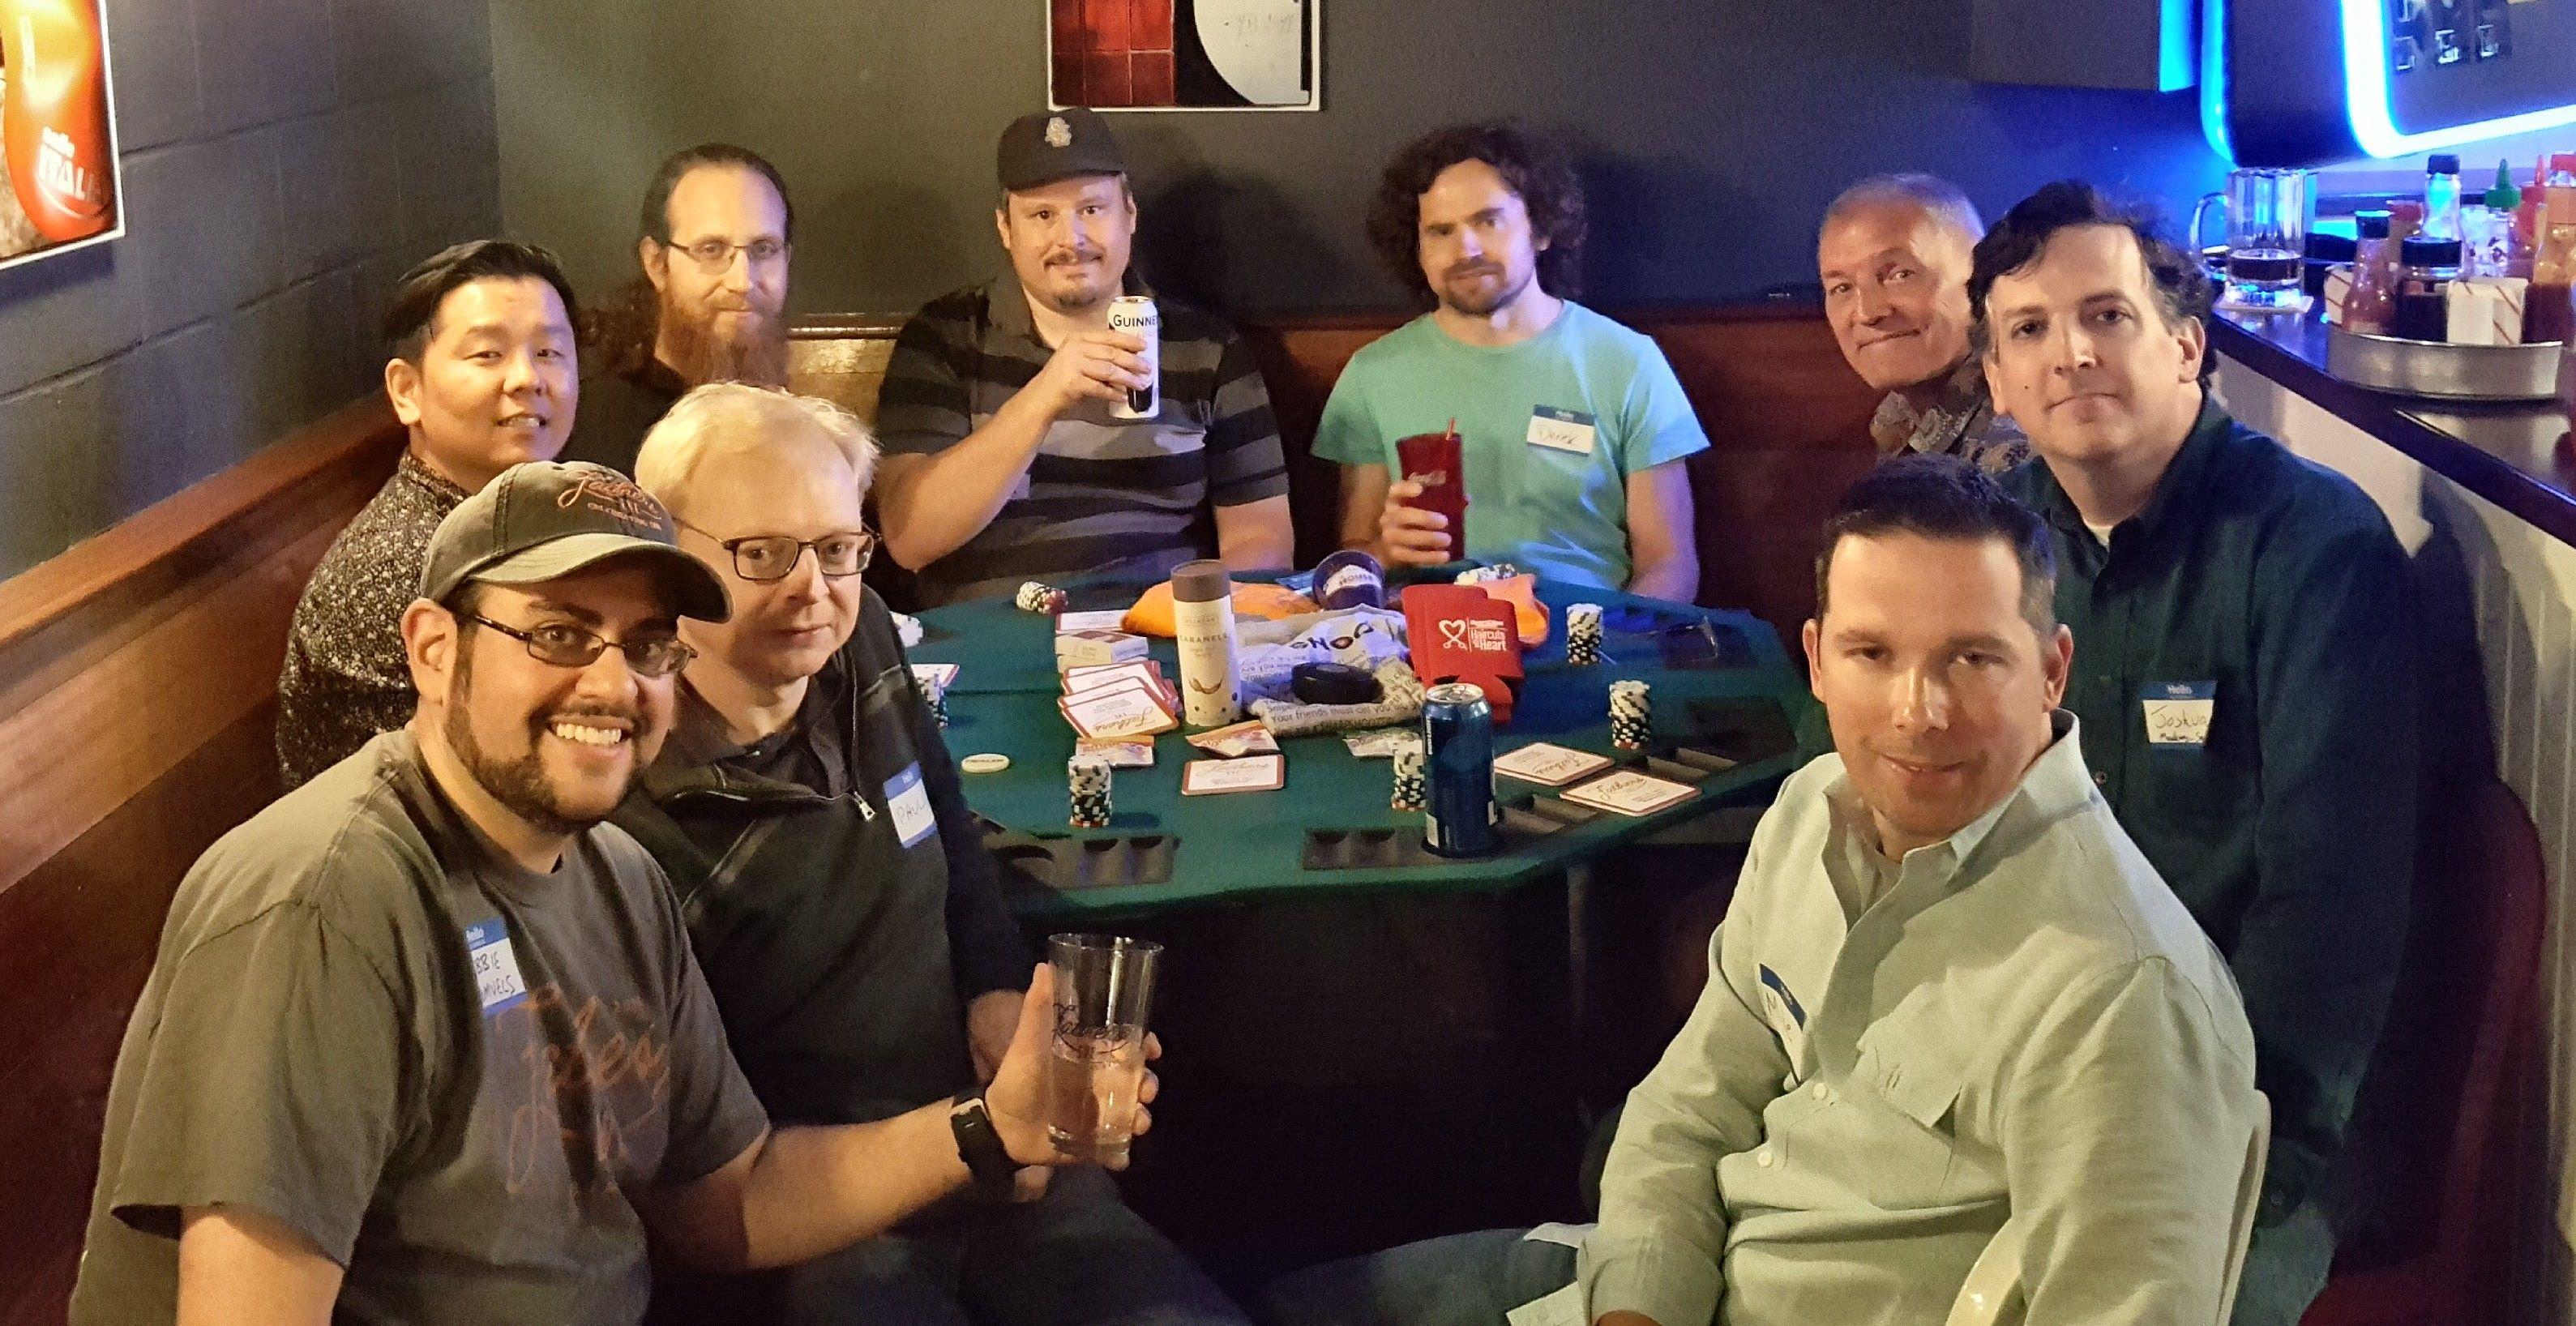 Boston Dads Group